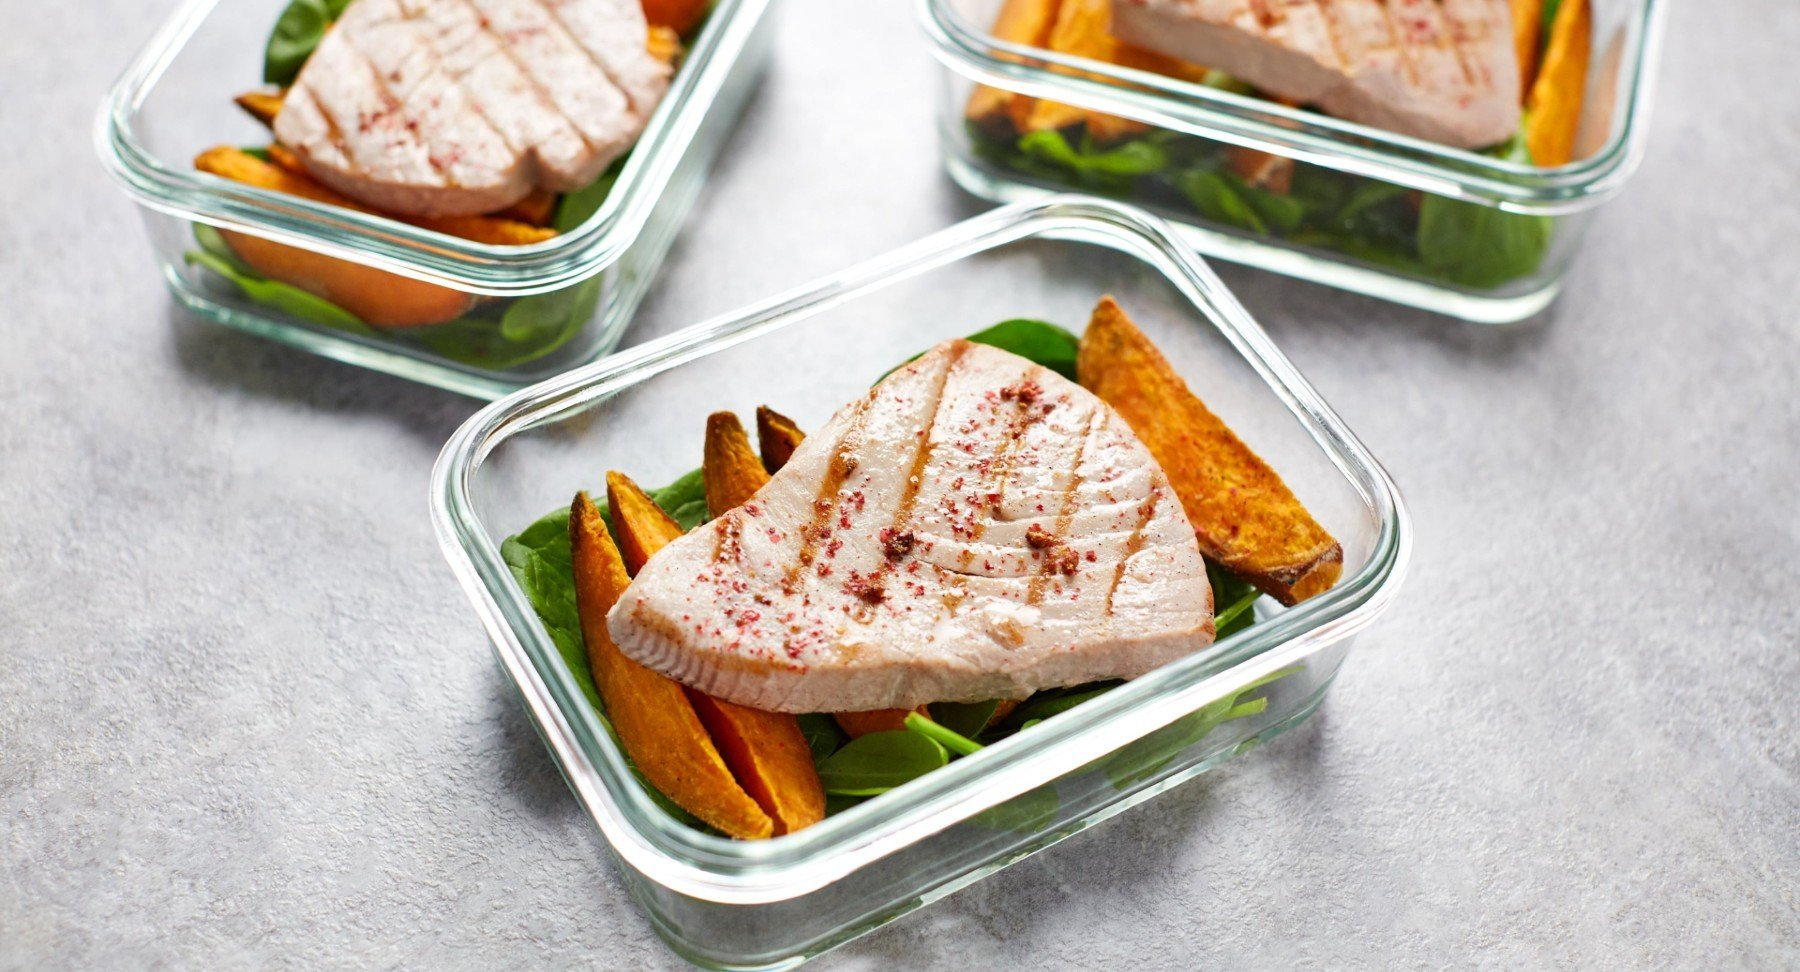 Tuna Steak Recipe Ideas | Seared Tuna & Sweet Potato Meal Prep